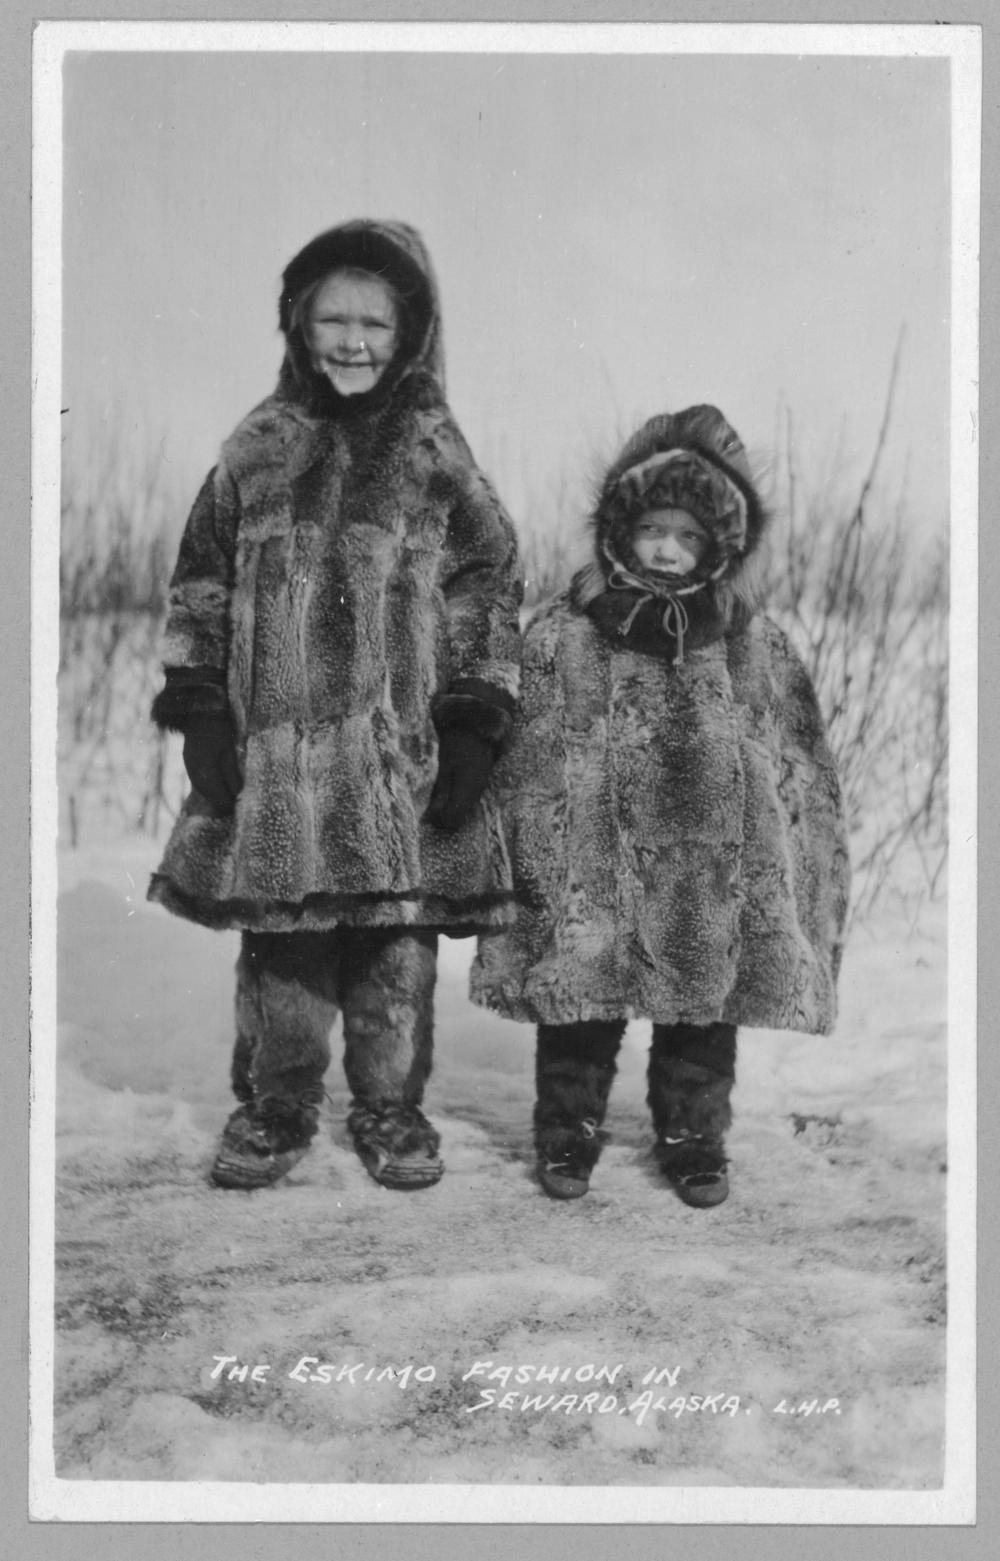 Children in Eskimo fur clothing